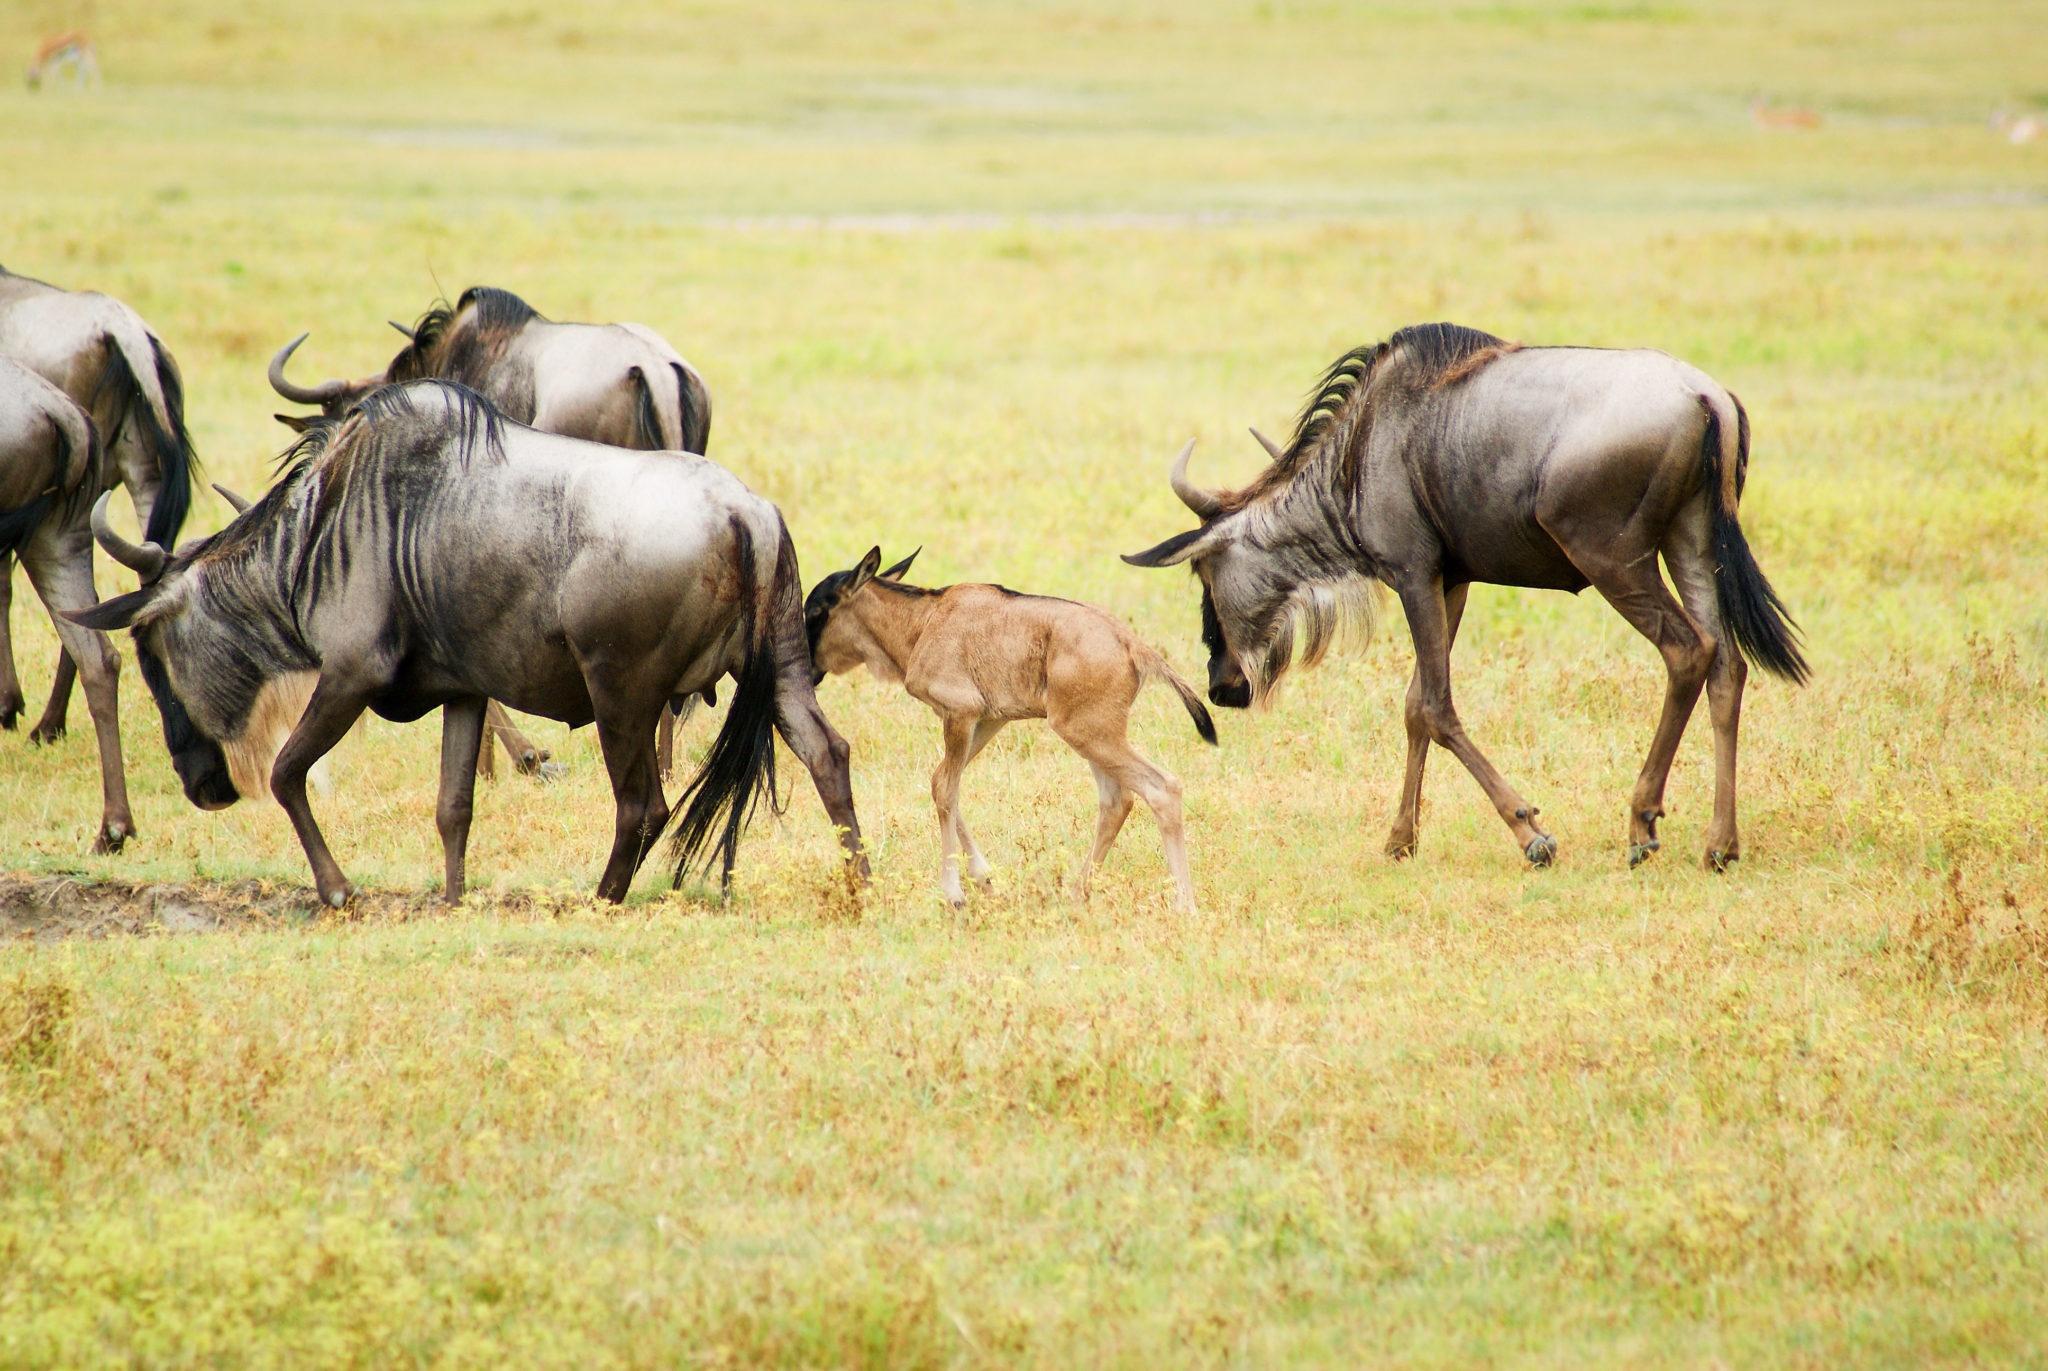 6 Days Wildebeest Migration Journey in July to September